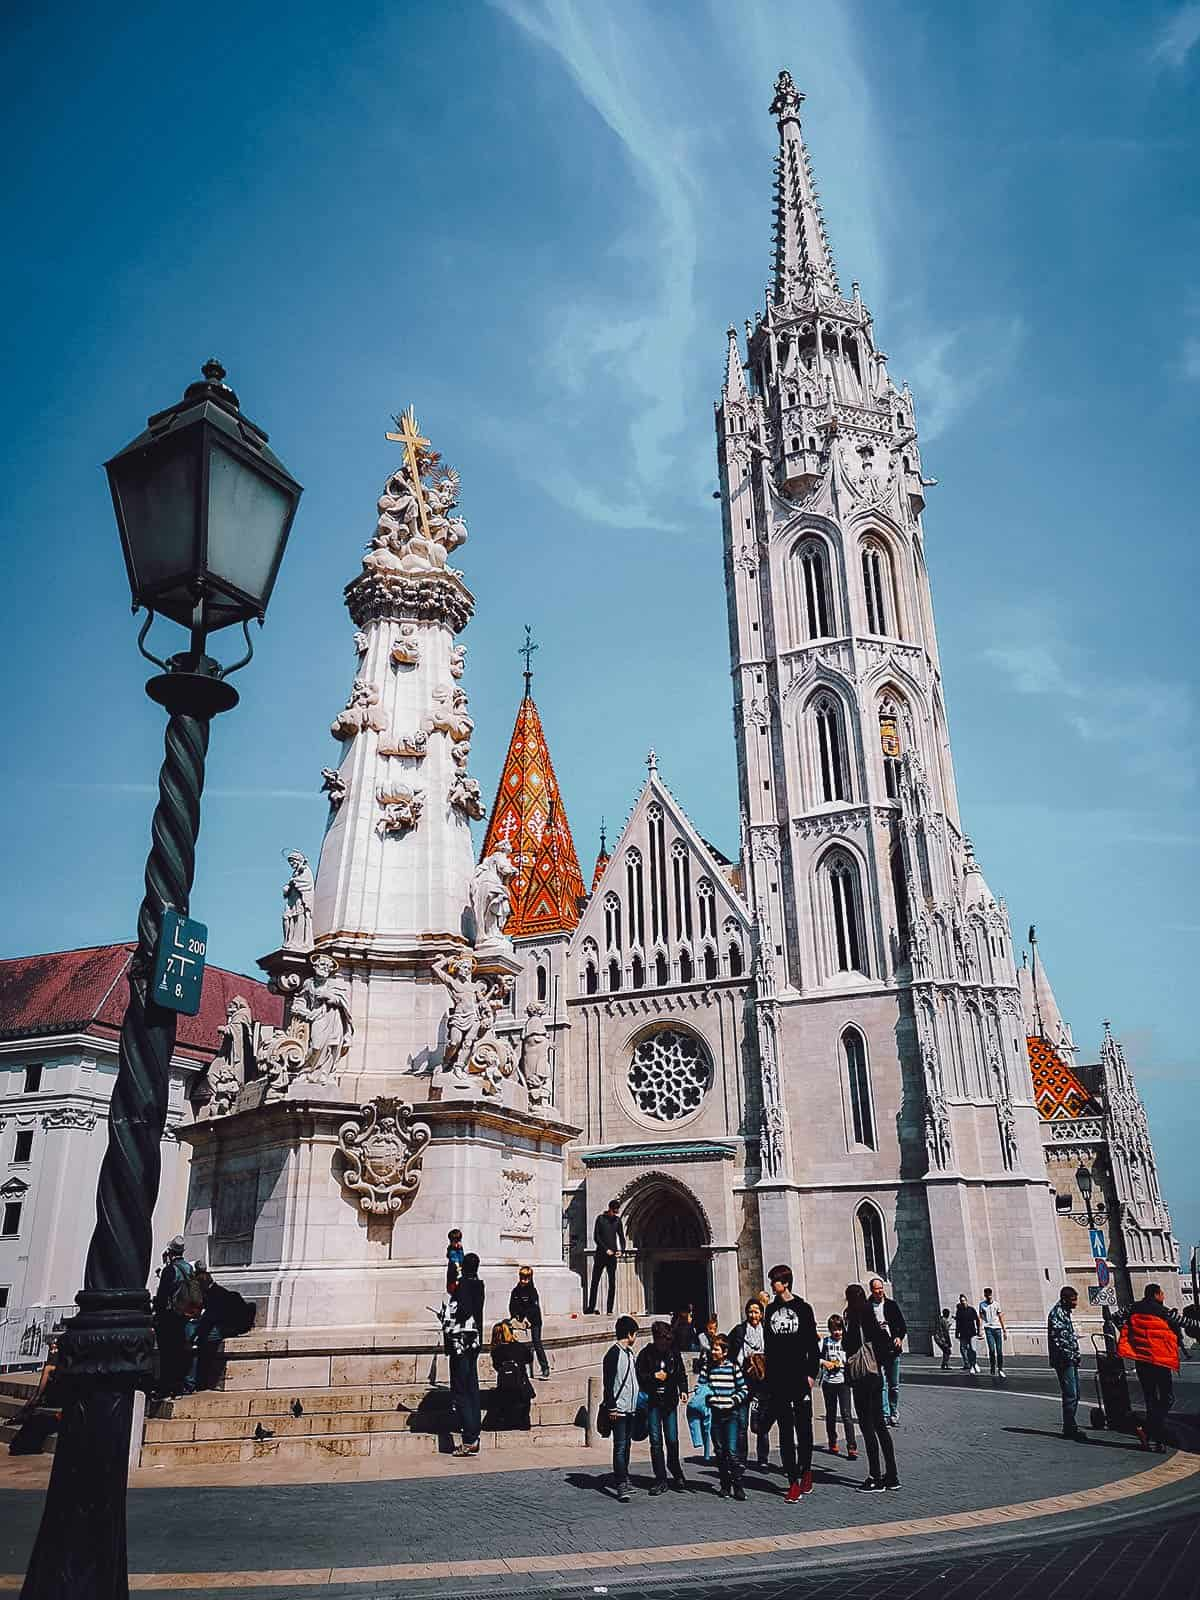 Exterior of Matthias Church in Budapest, Hungary